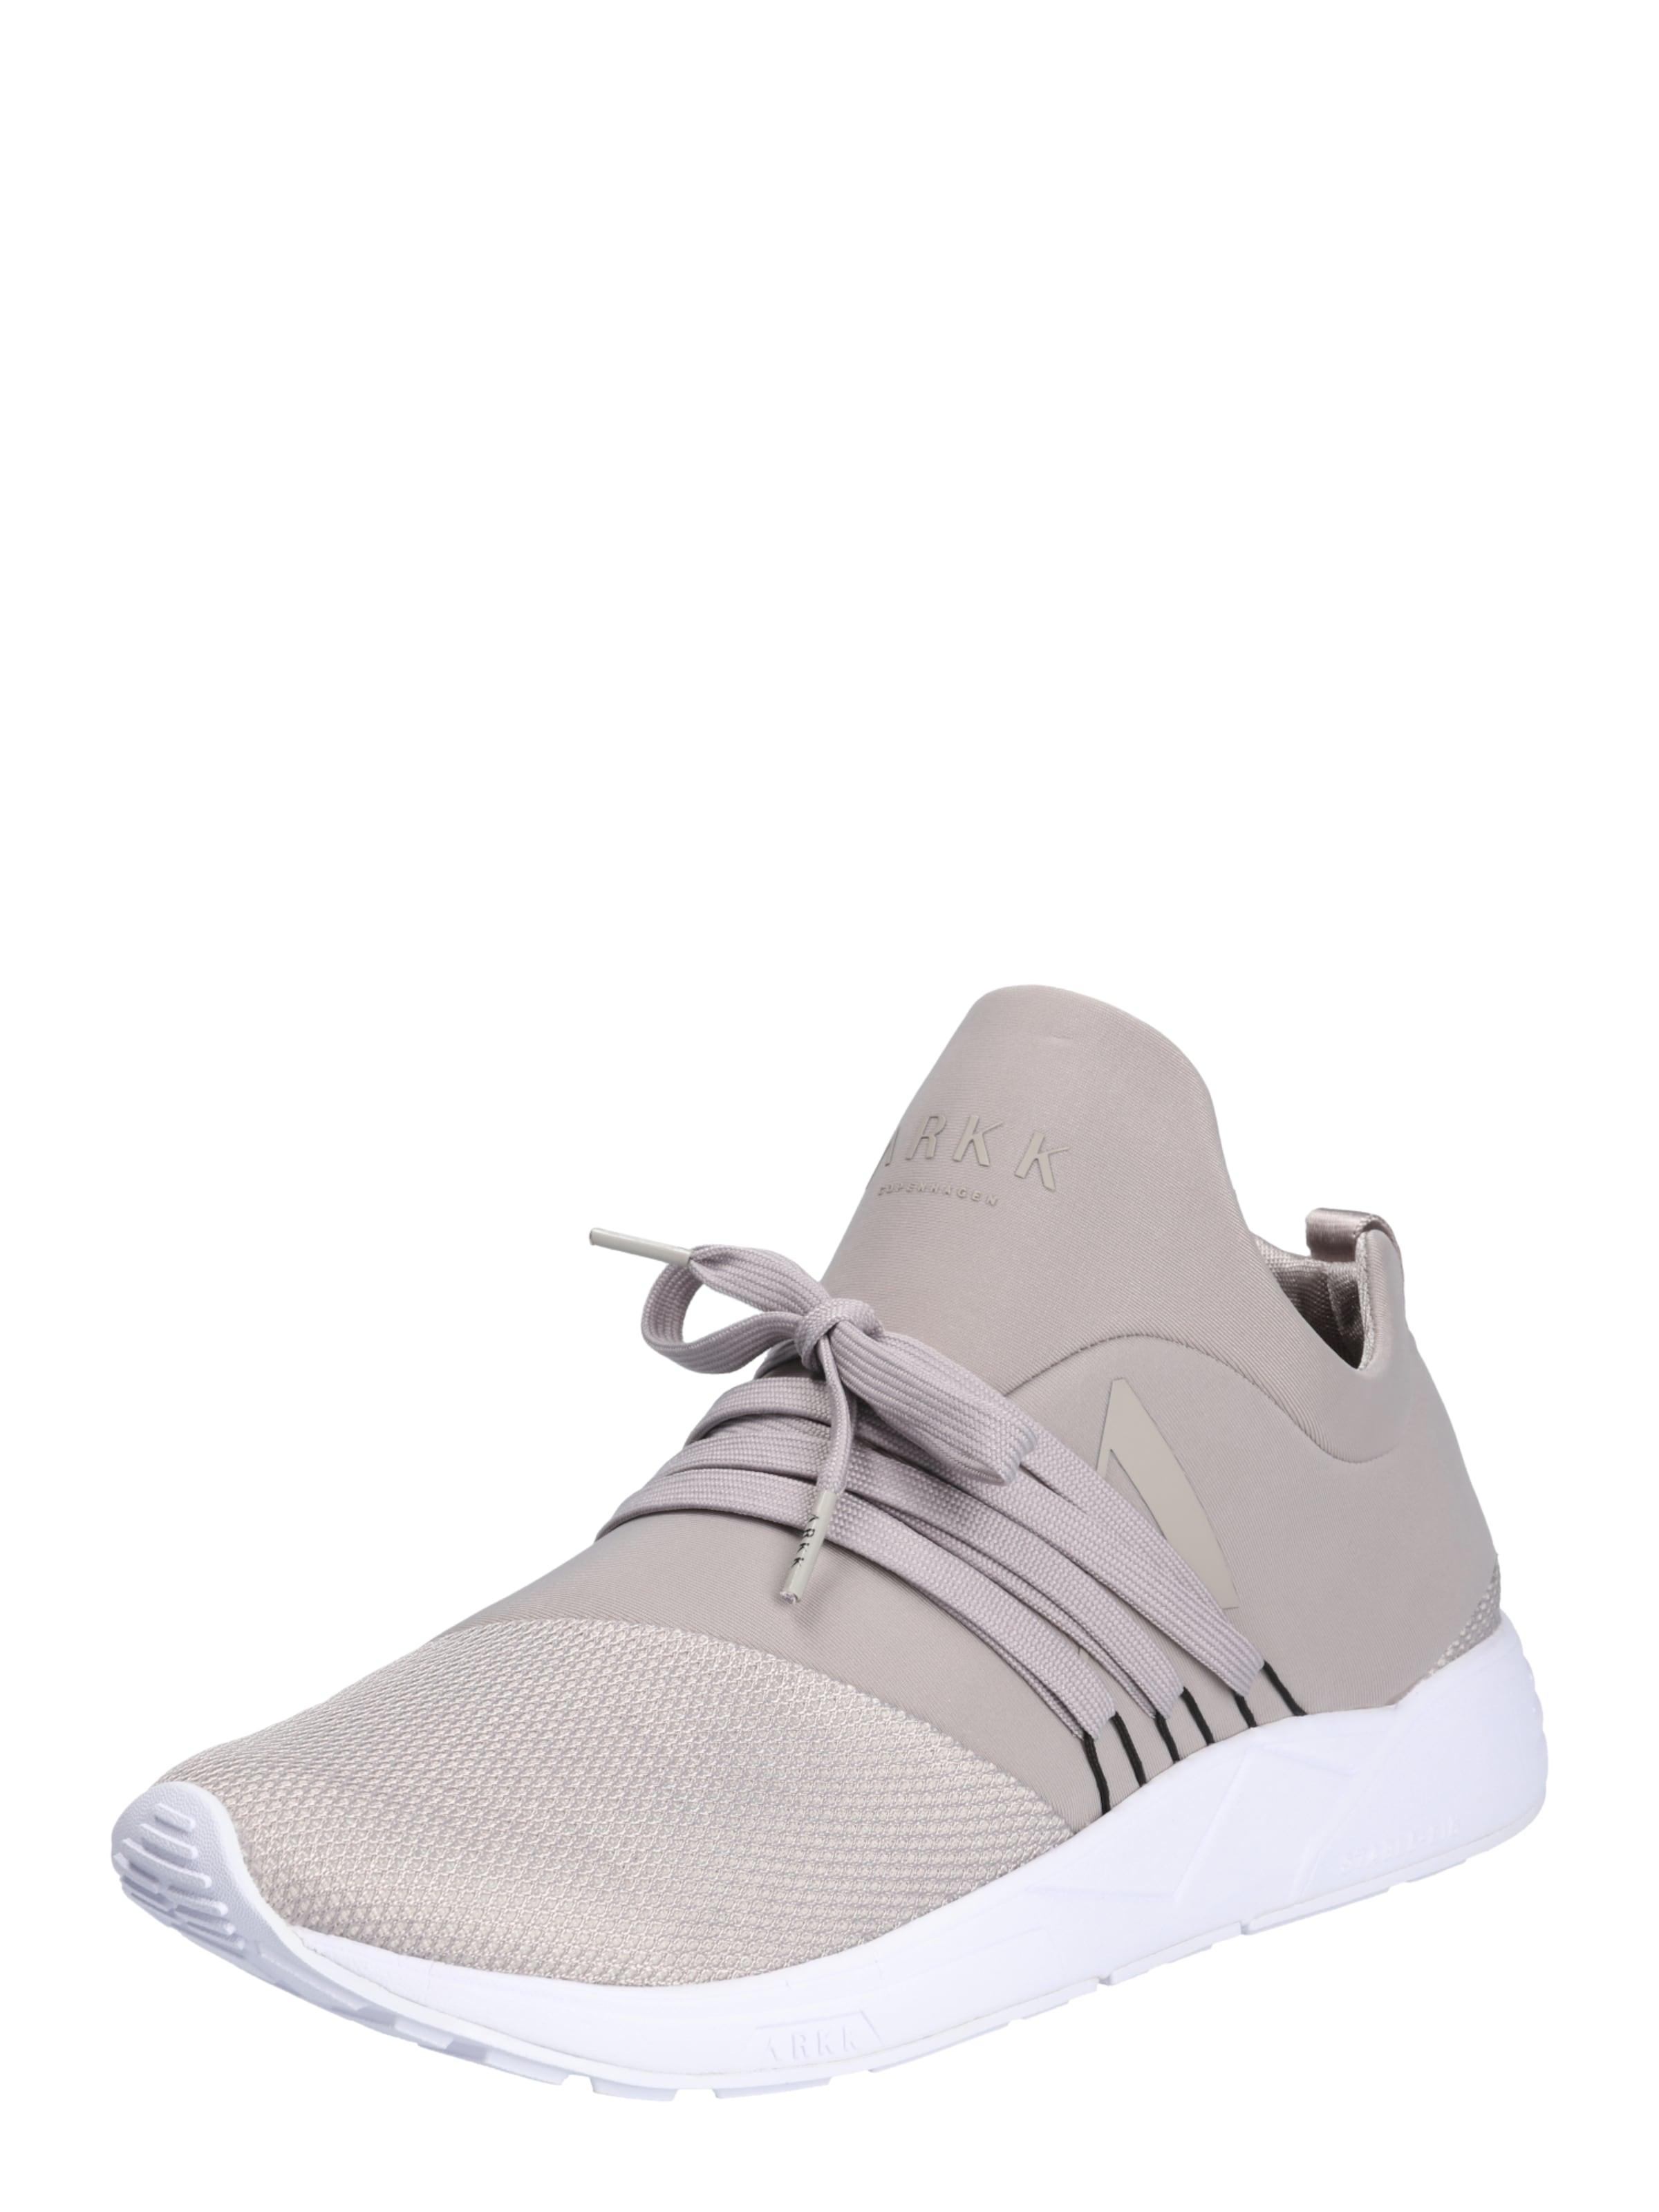 Haltbare Mode billige Schuhe ARKK Schuhe Copenhagen | Sneaker 'Raven' Schuhe ARKK Gut getragene Schuhe 457be8